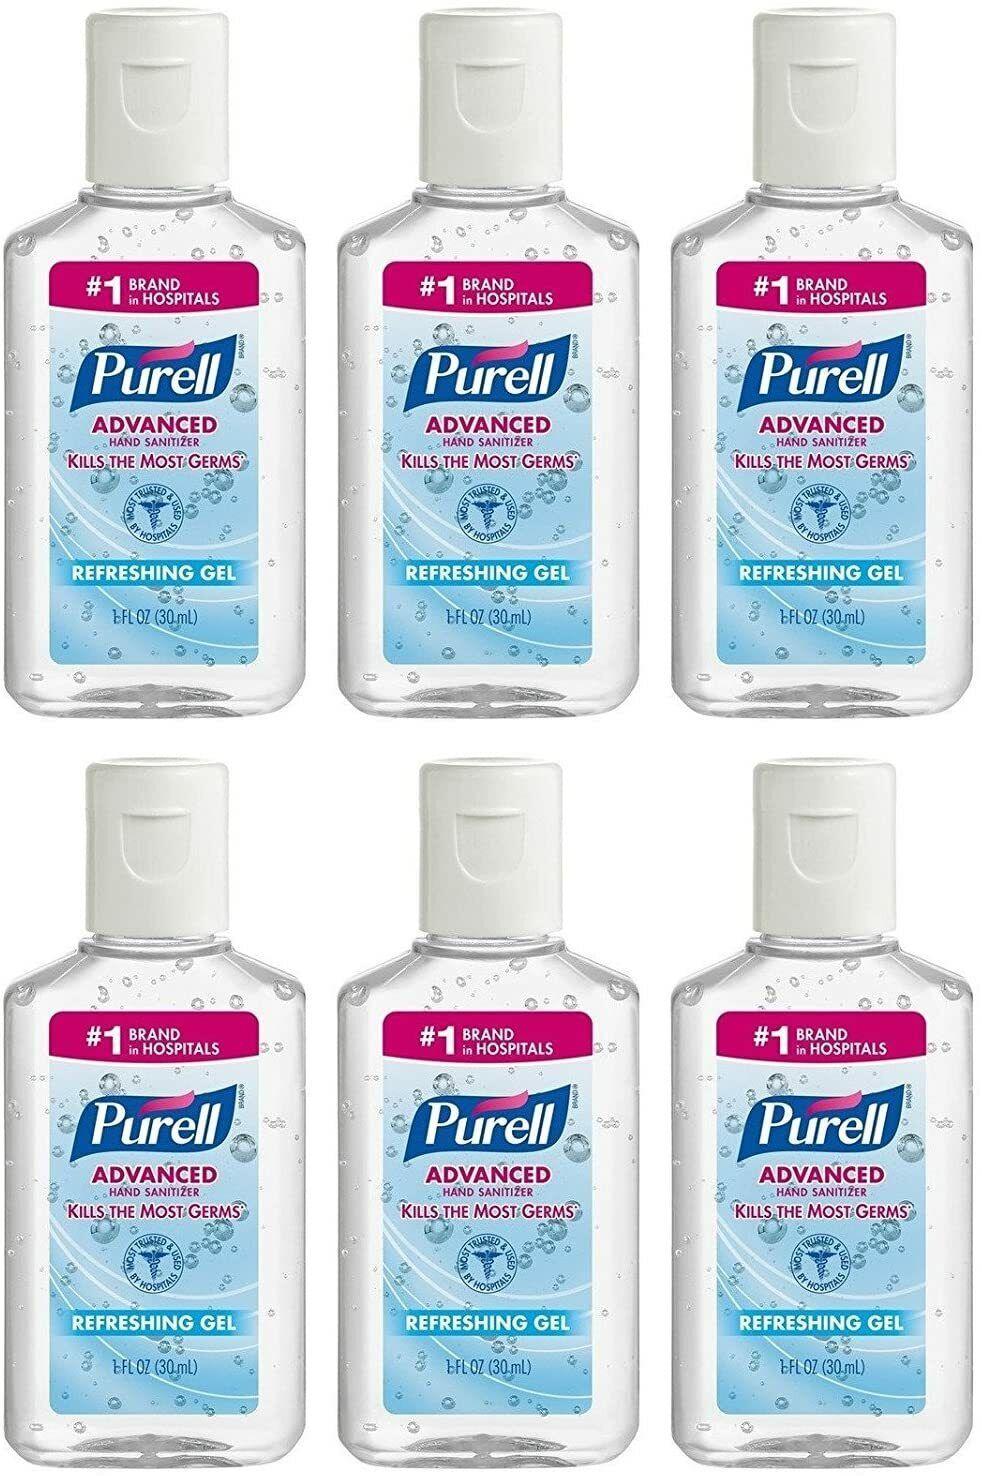 PURELL Advanced Hand Sanitizer, Refreshing Gel, 36 - 1 fl oz